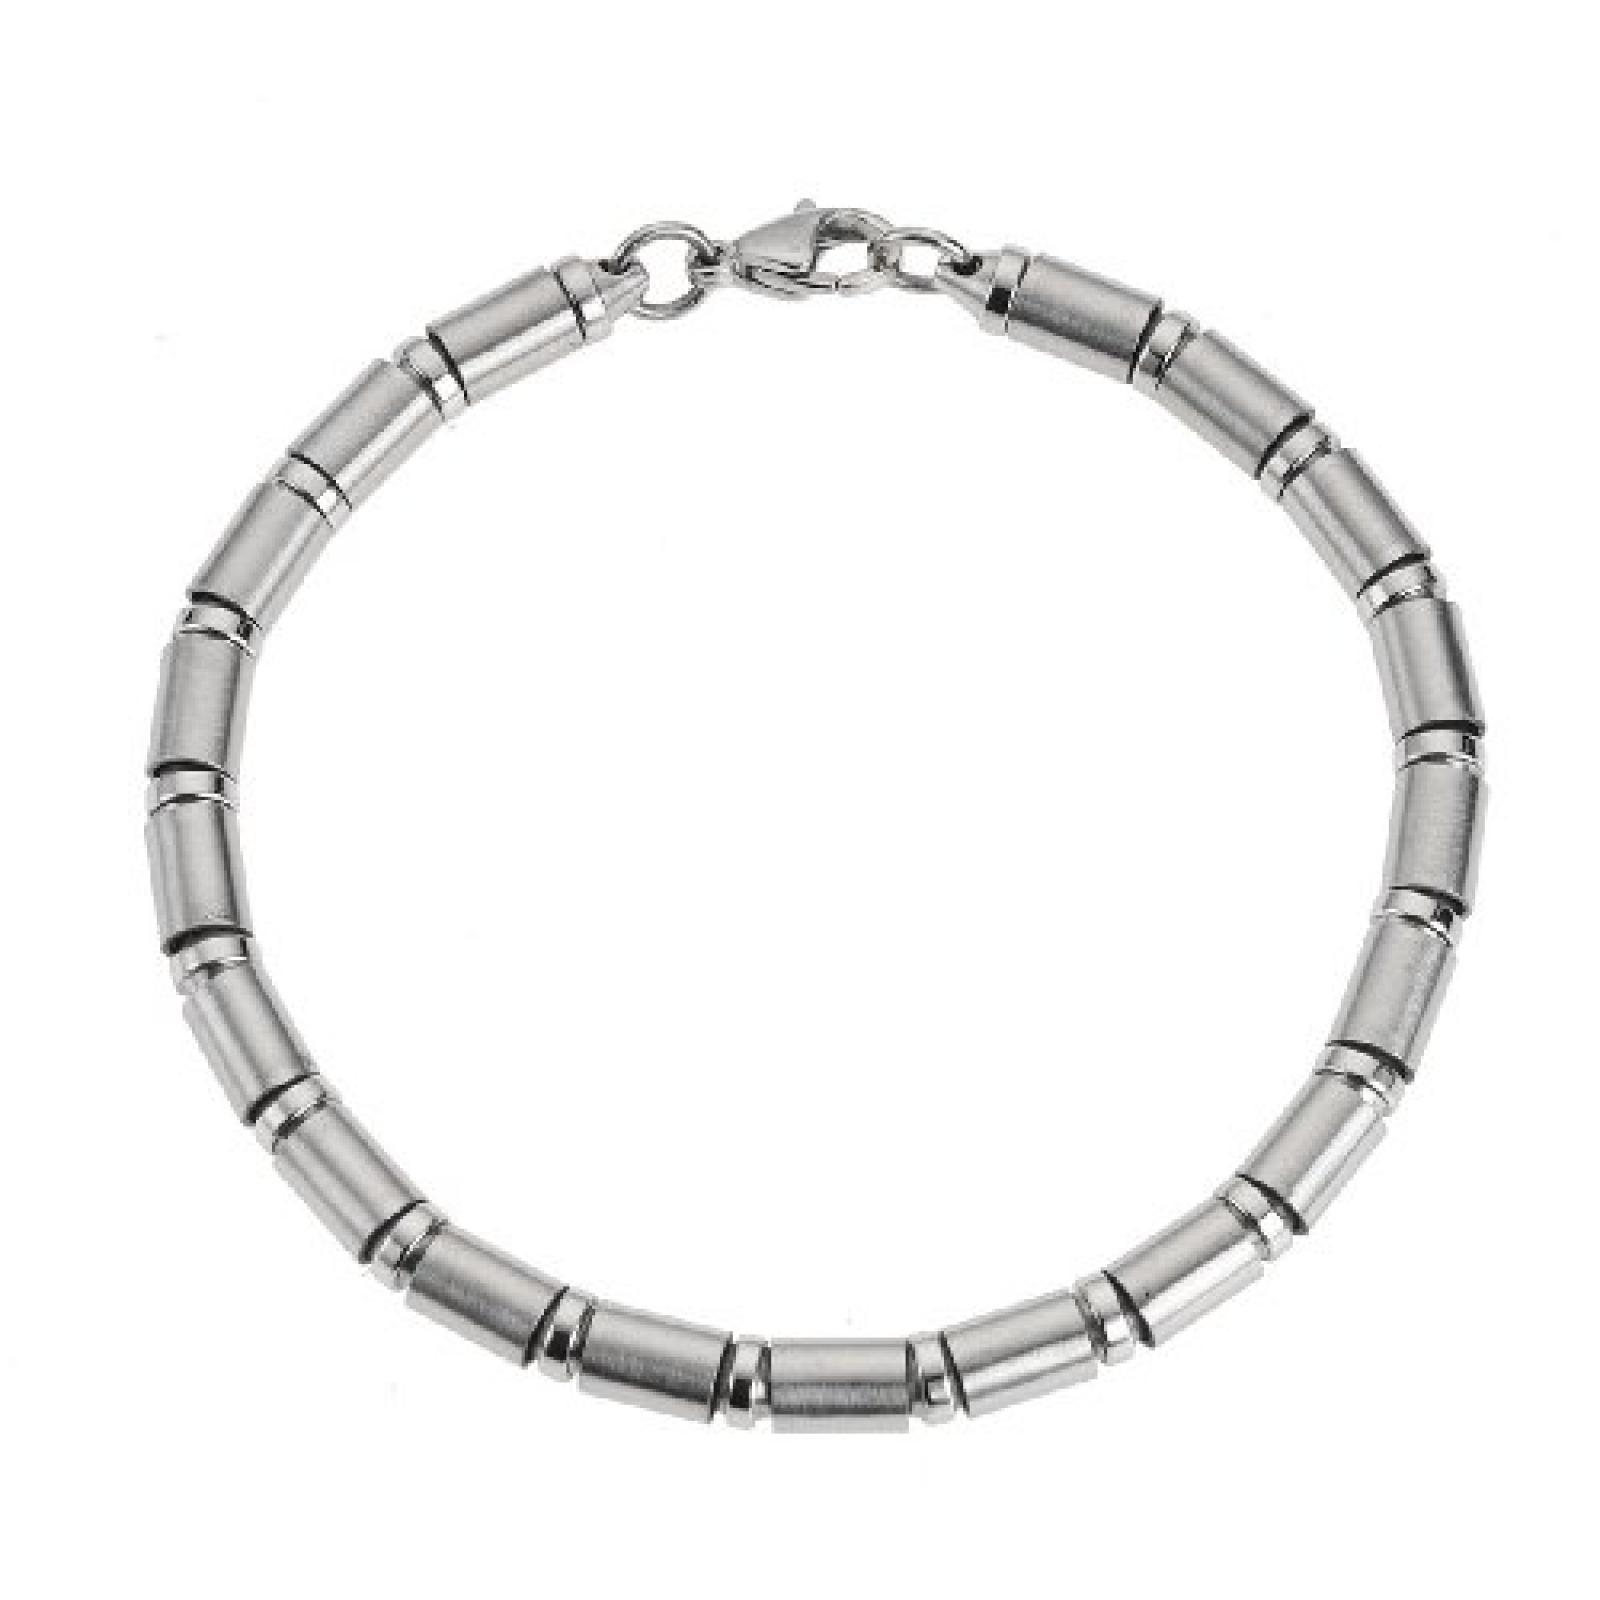 ZEEme Stainless Steel Armband 5mm stark aus Stahl und 21cm lang 385060017-21